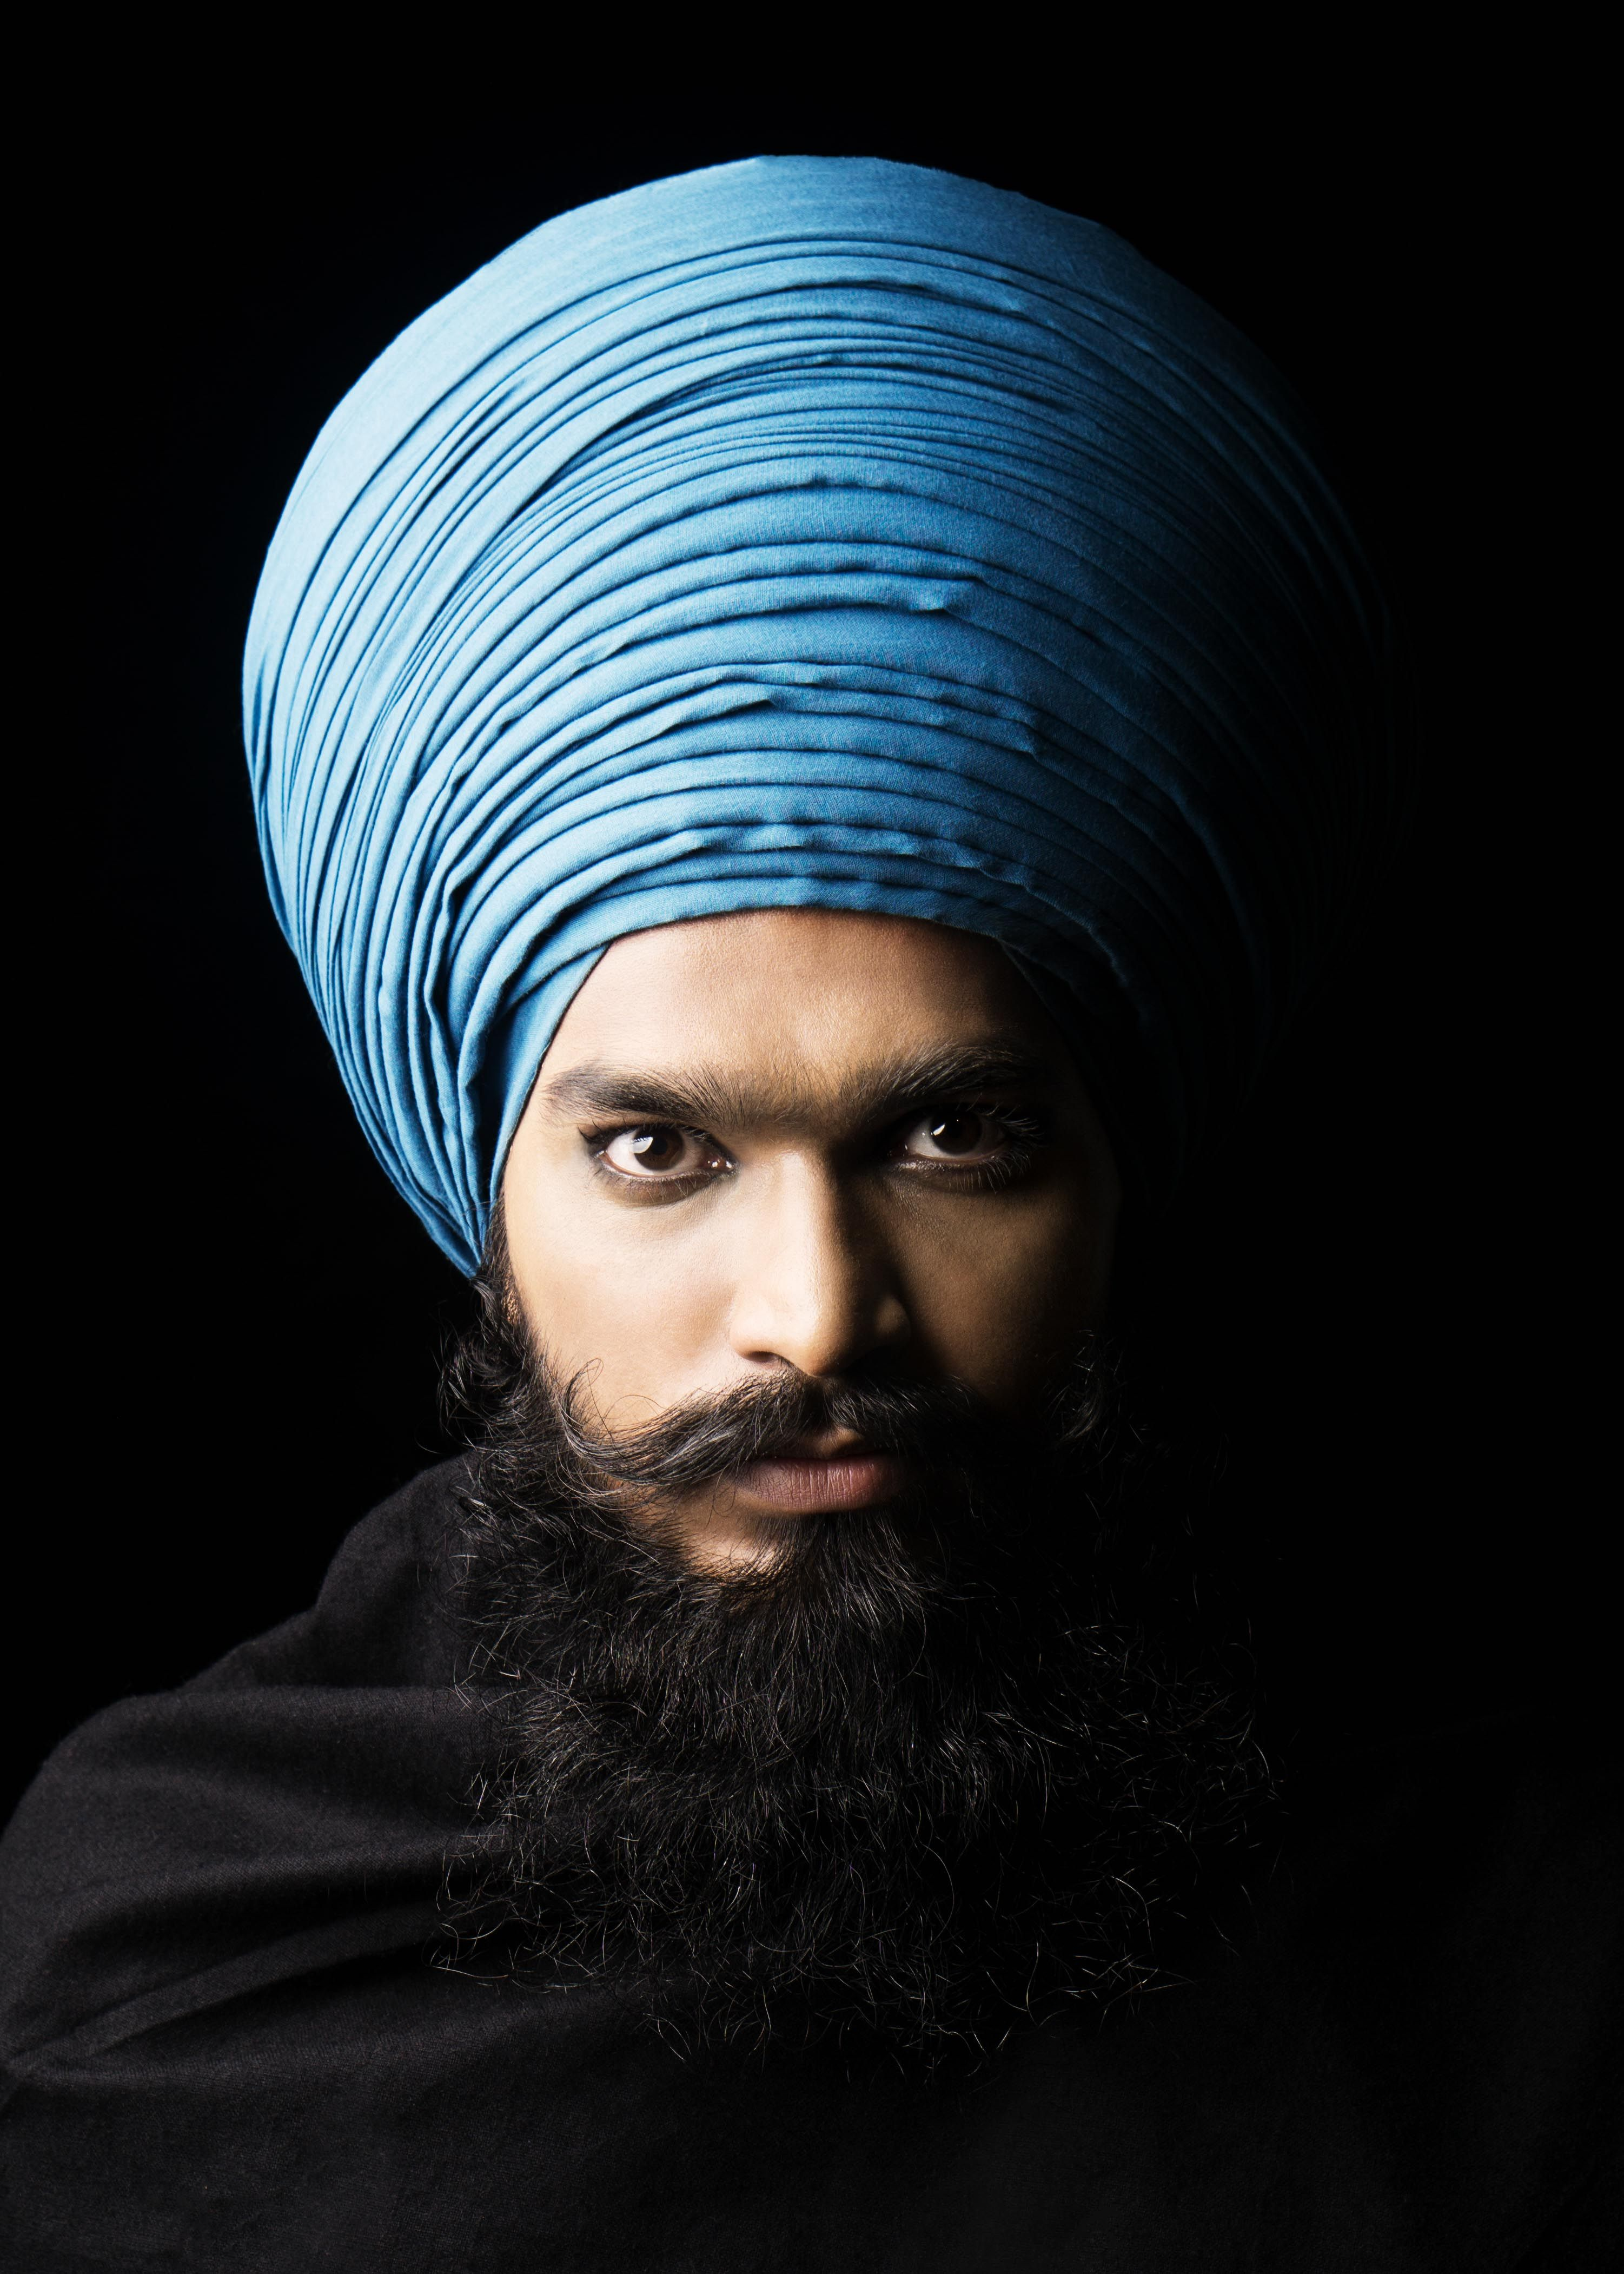 sikh turban style에 대한 이미지 검색결과